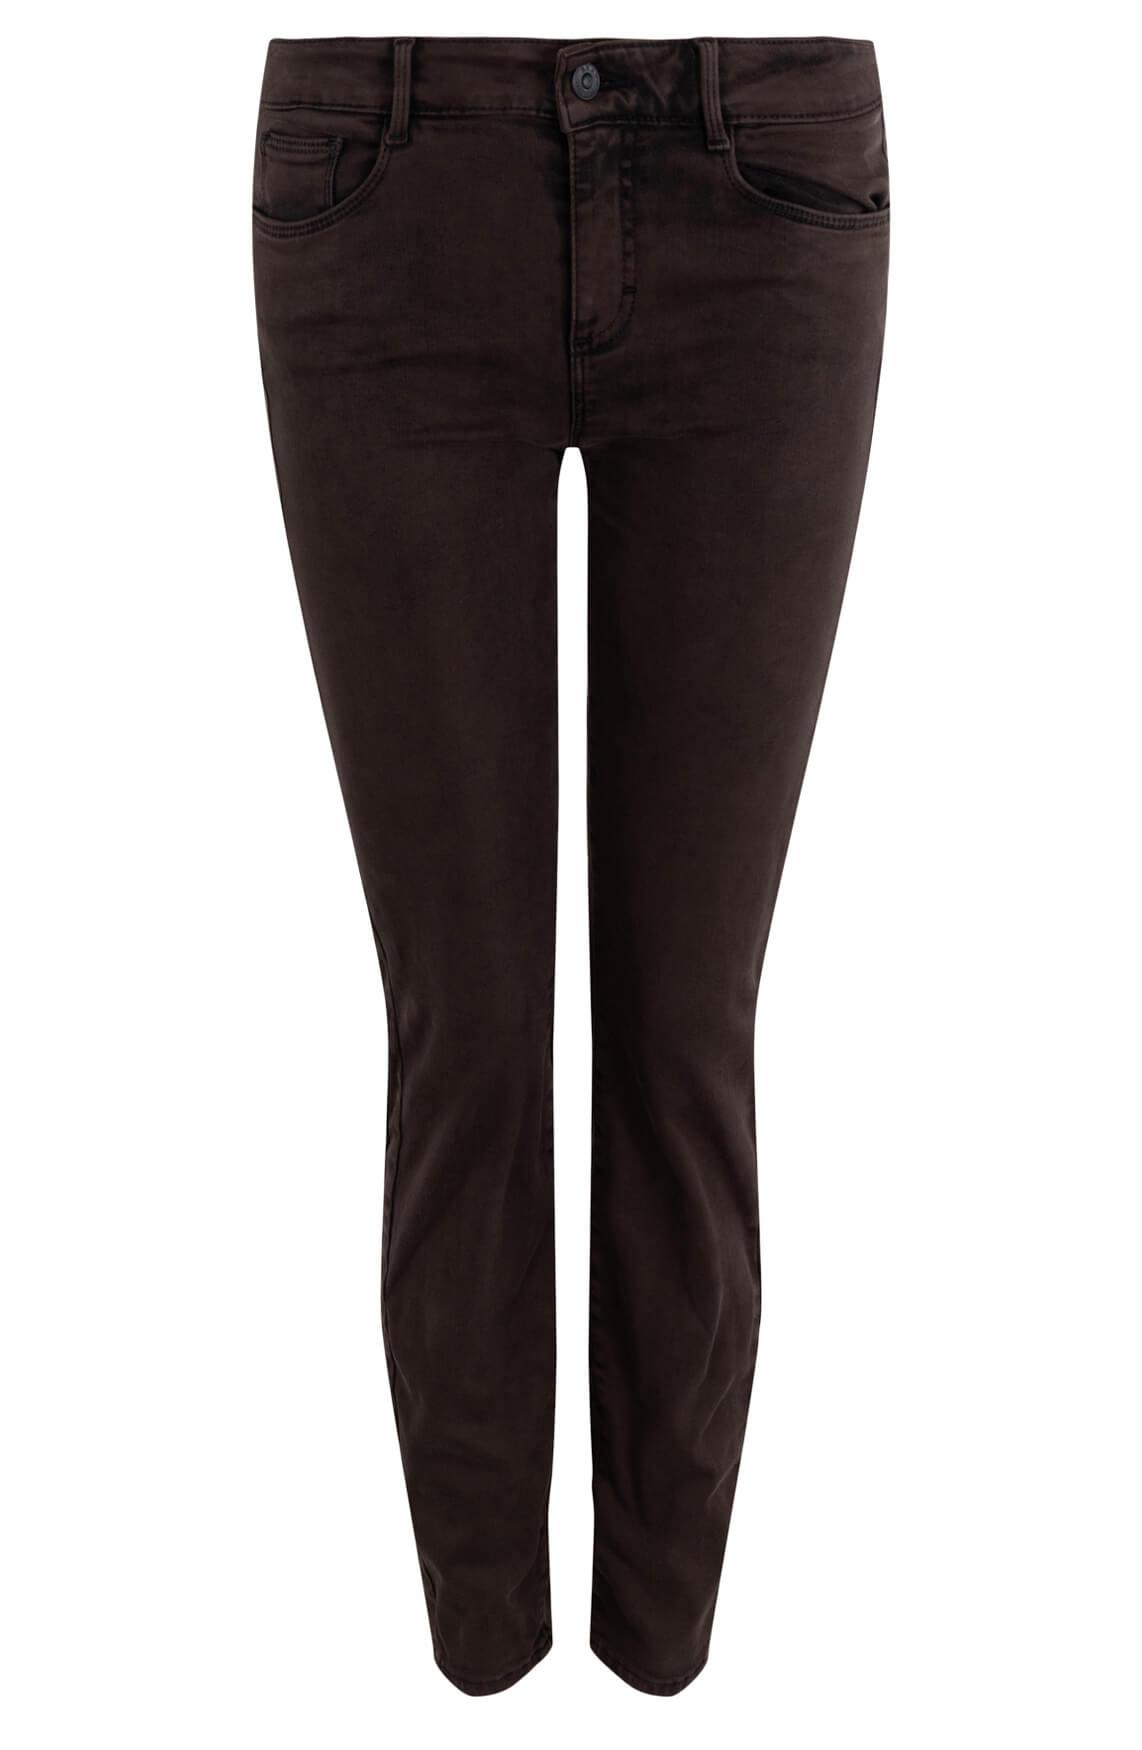 Brax Finest Dames Ana jeans Bruin